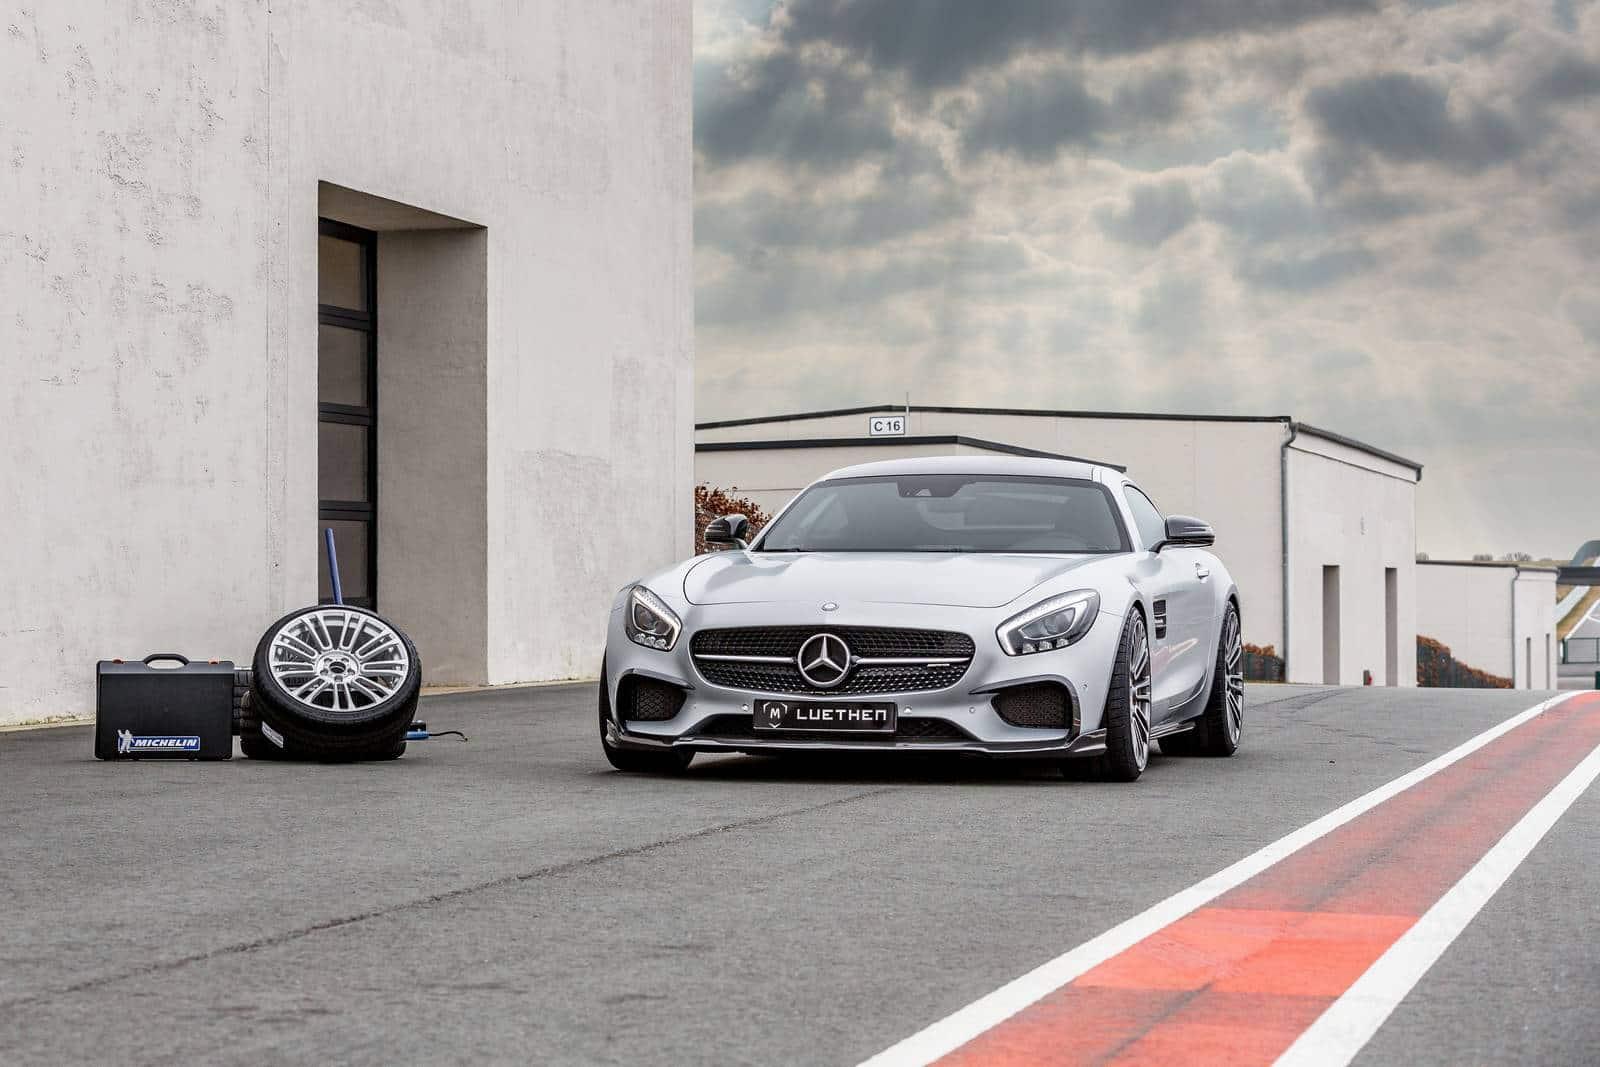 Luethen Mercedes-AMG GT